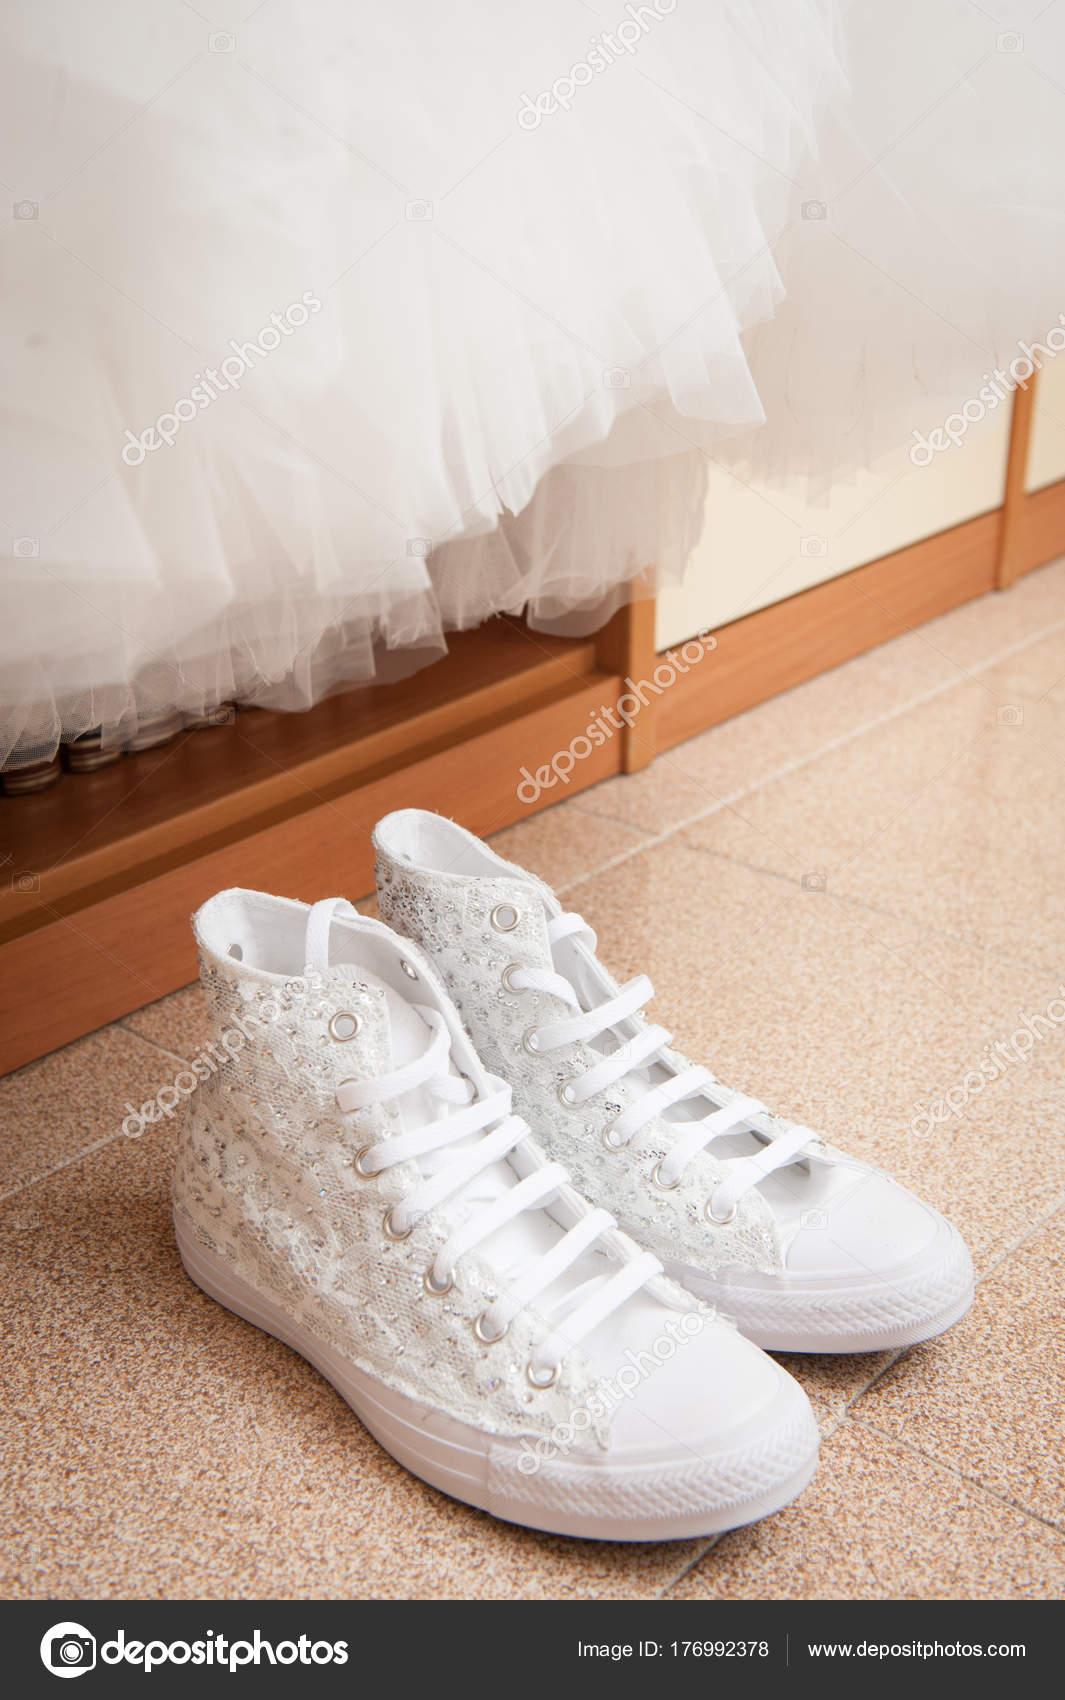 the best attitude 6470f 18fdc Weißes Brautkleid Und Sneakers — Stockfoto © vpardi #176992378